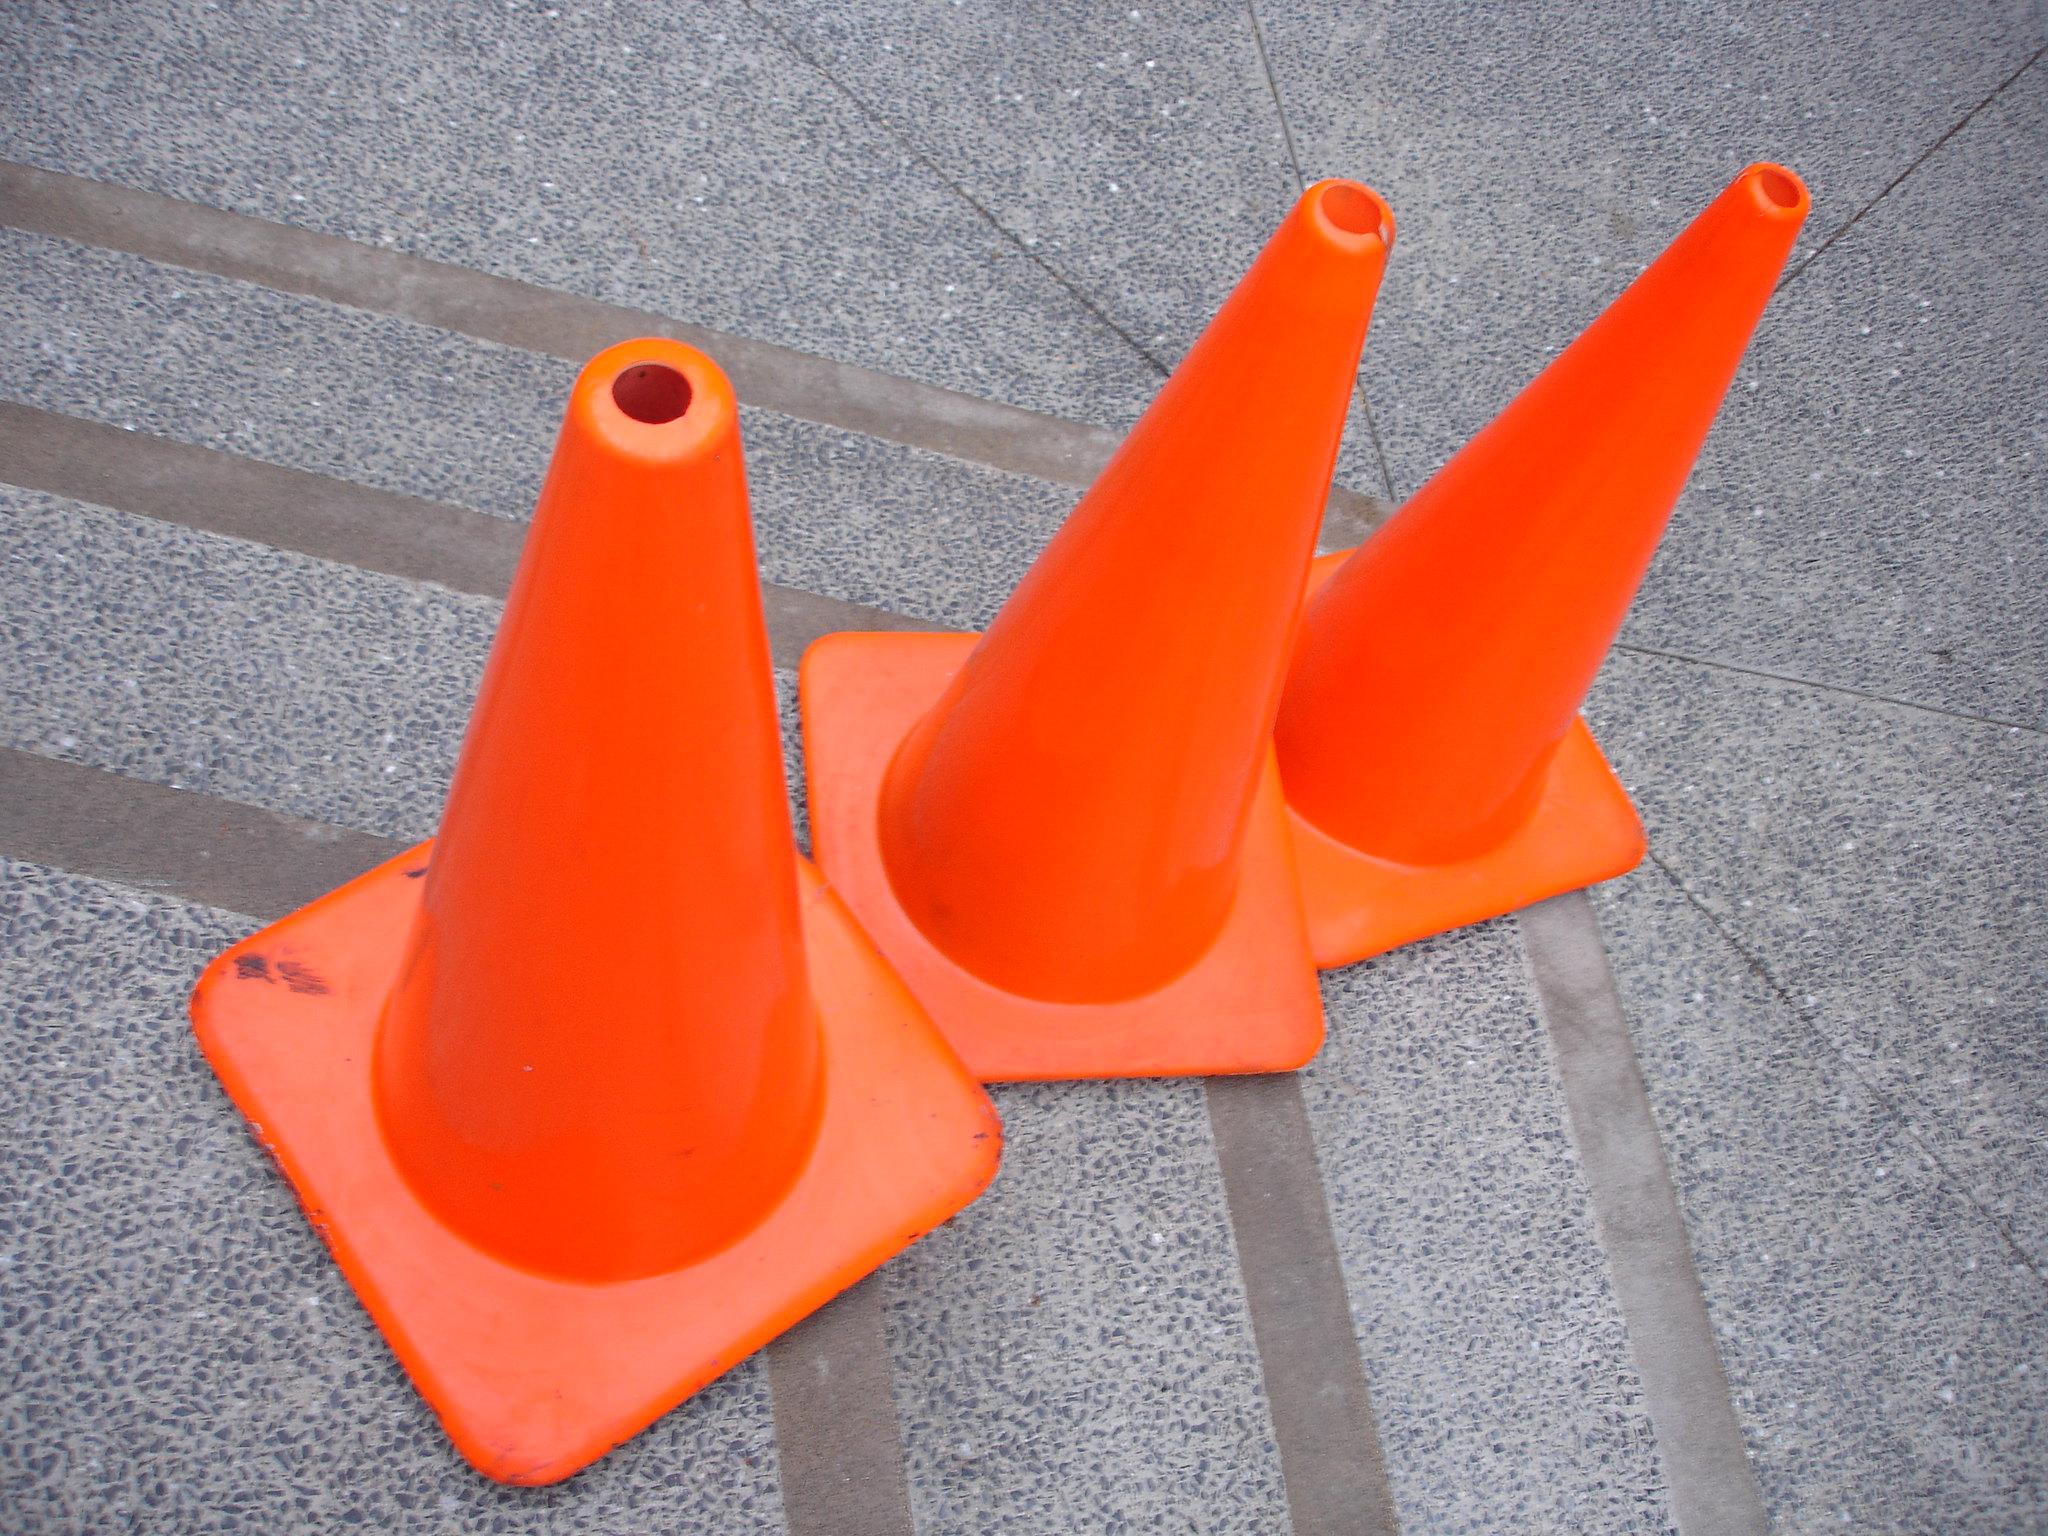 Traffic cones. (Credit: Matthew Robinson/ Flickr)